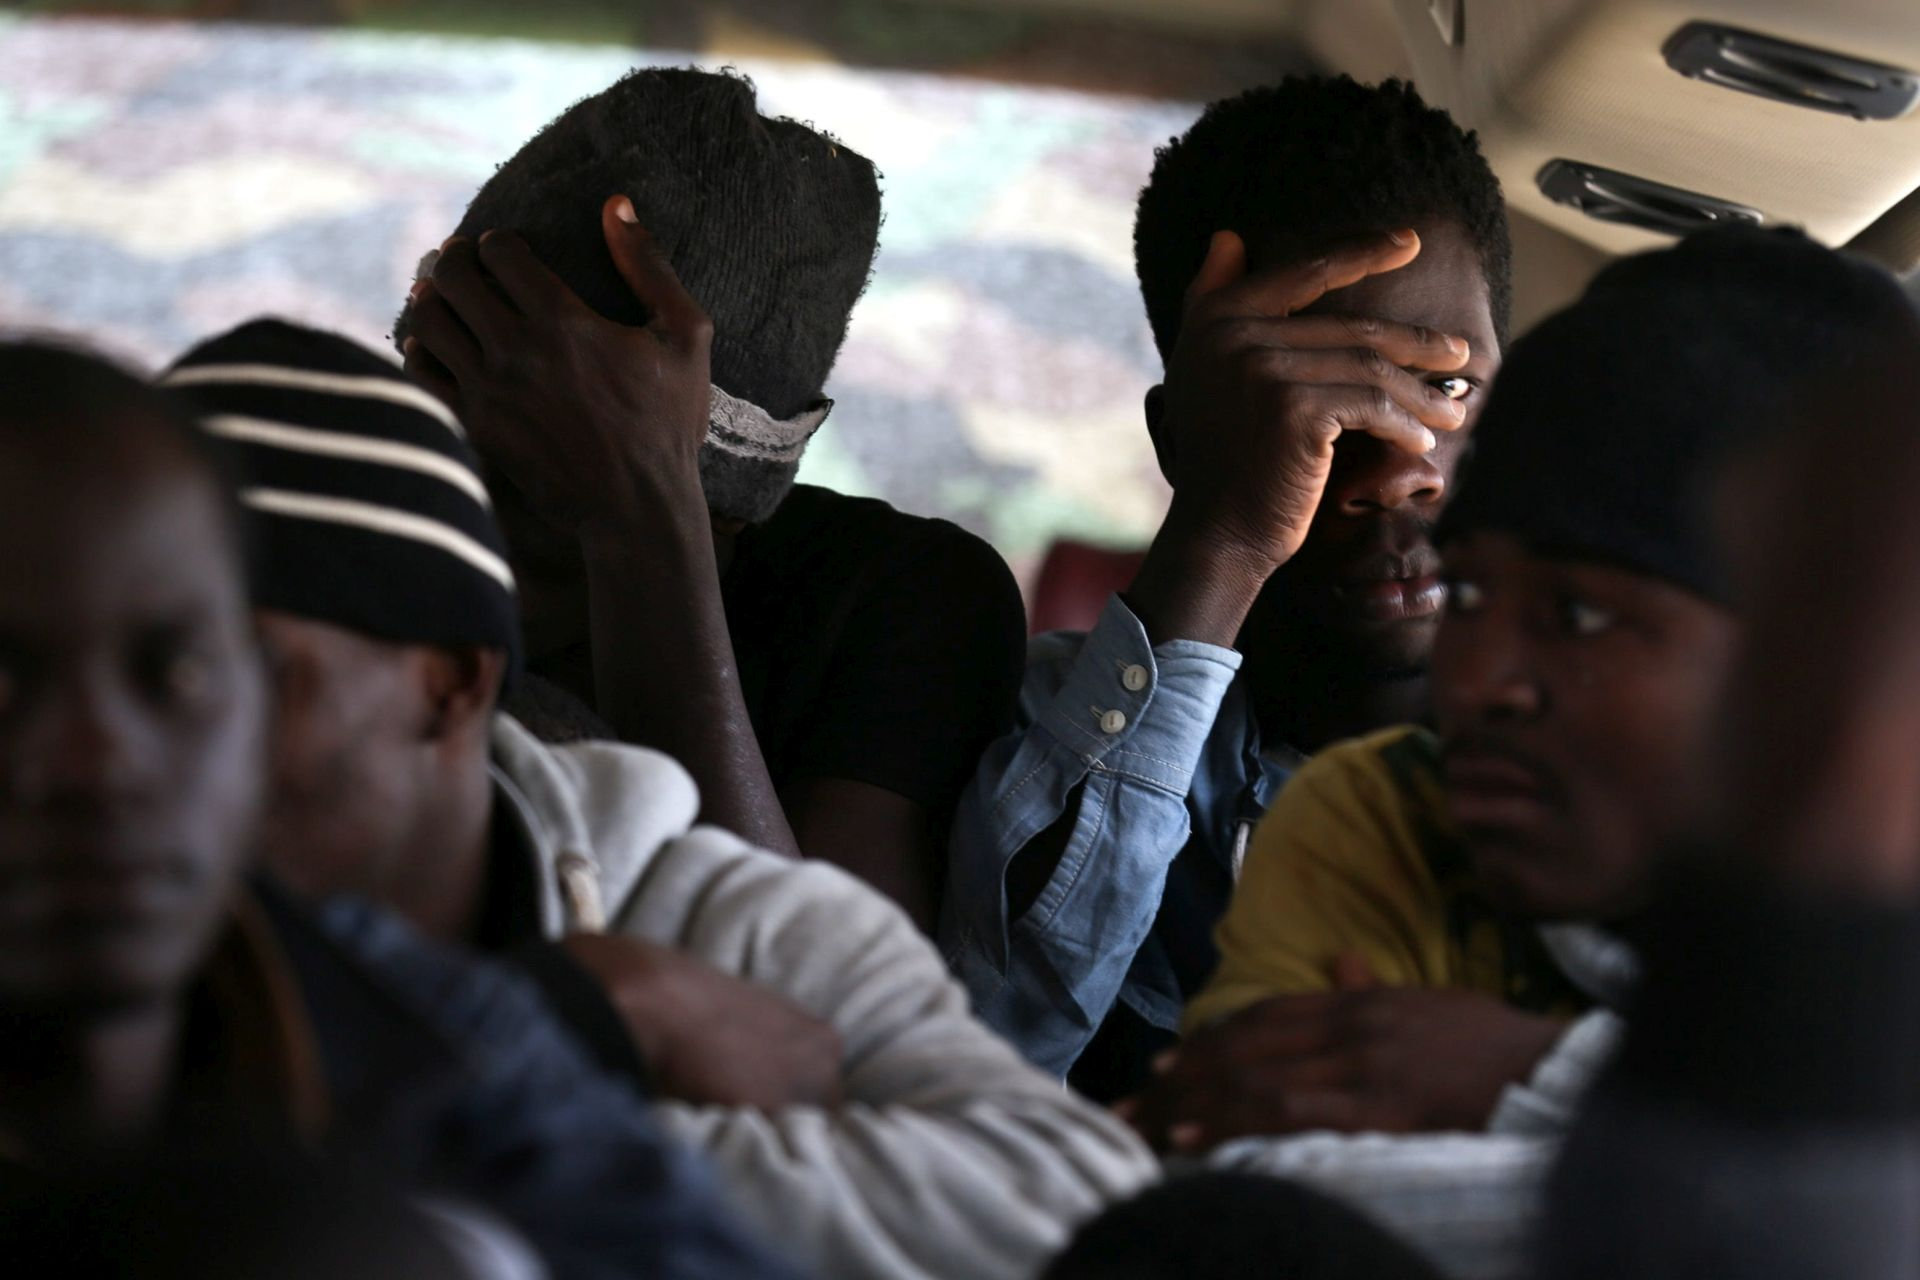 POTONUĆE GUMENJAKA: Osamdeset četiri migranta nestala blizu Libije